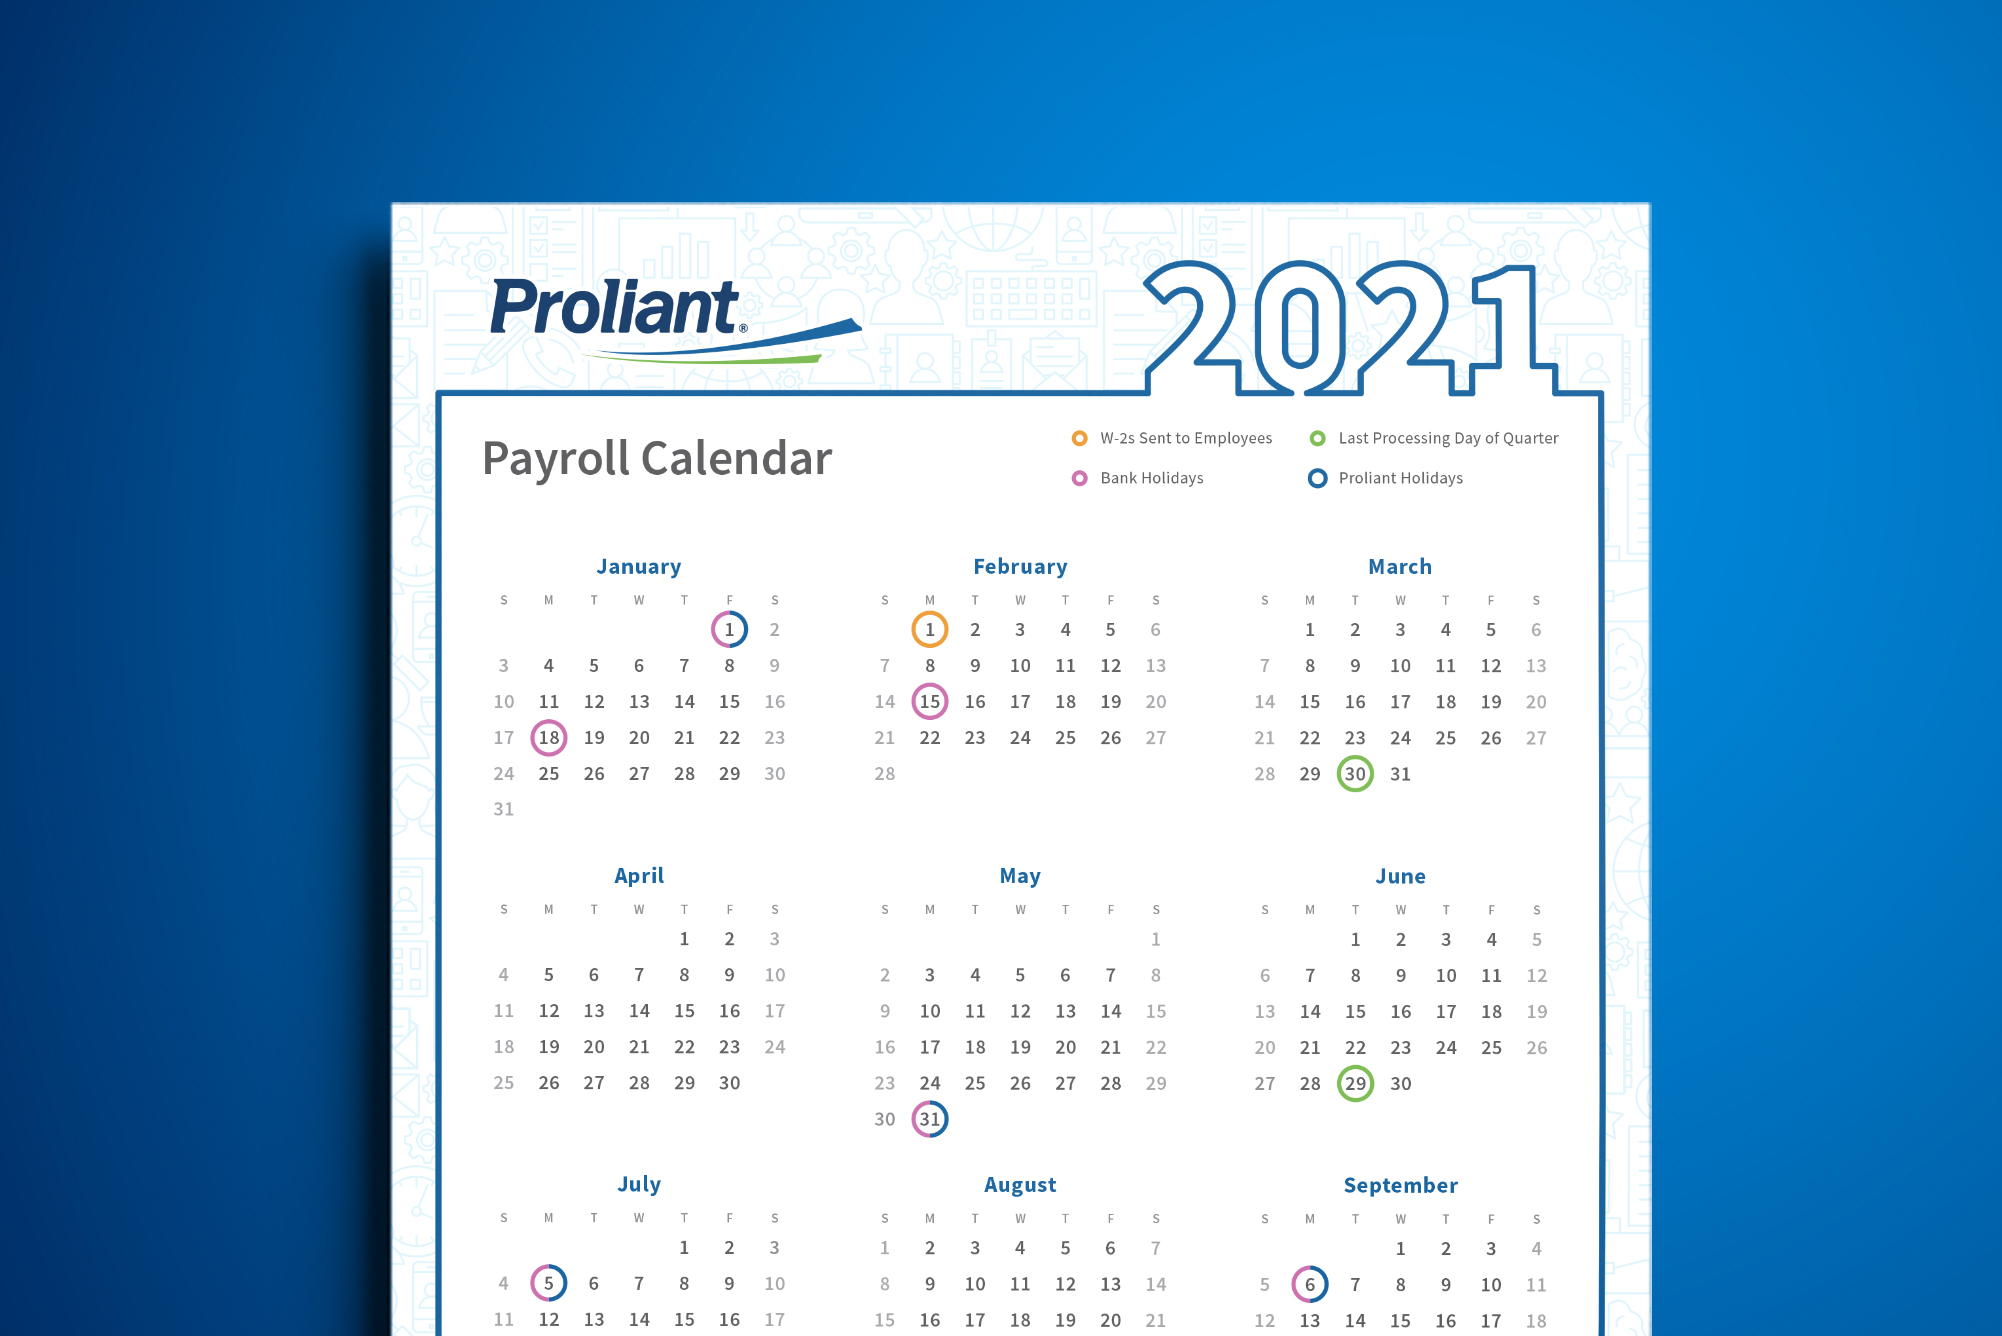 proliant-payroll-calendar-2021-mockup